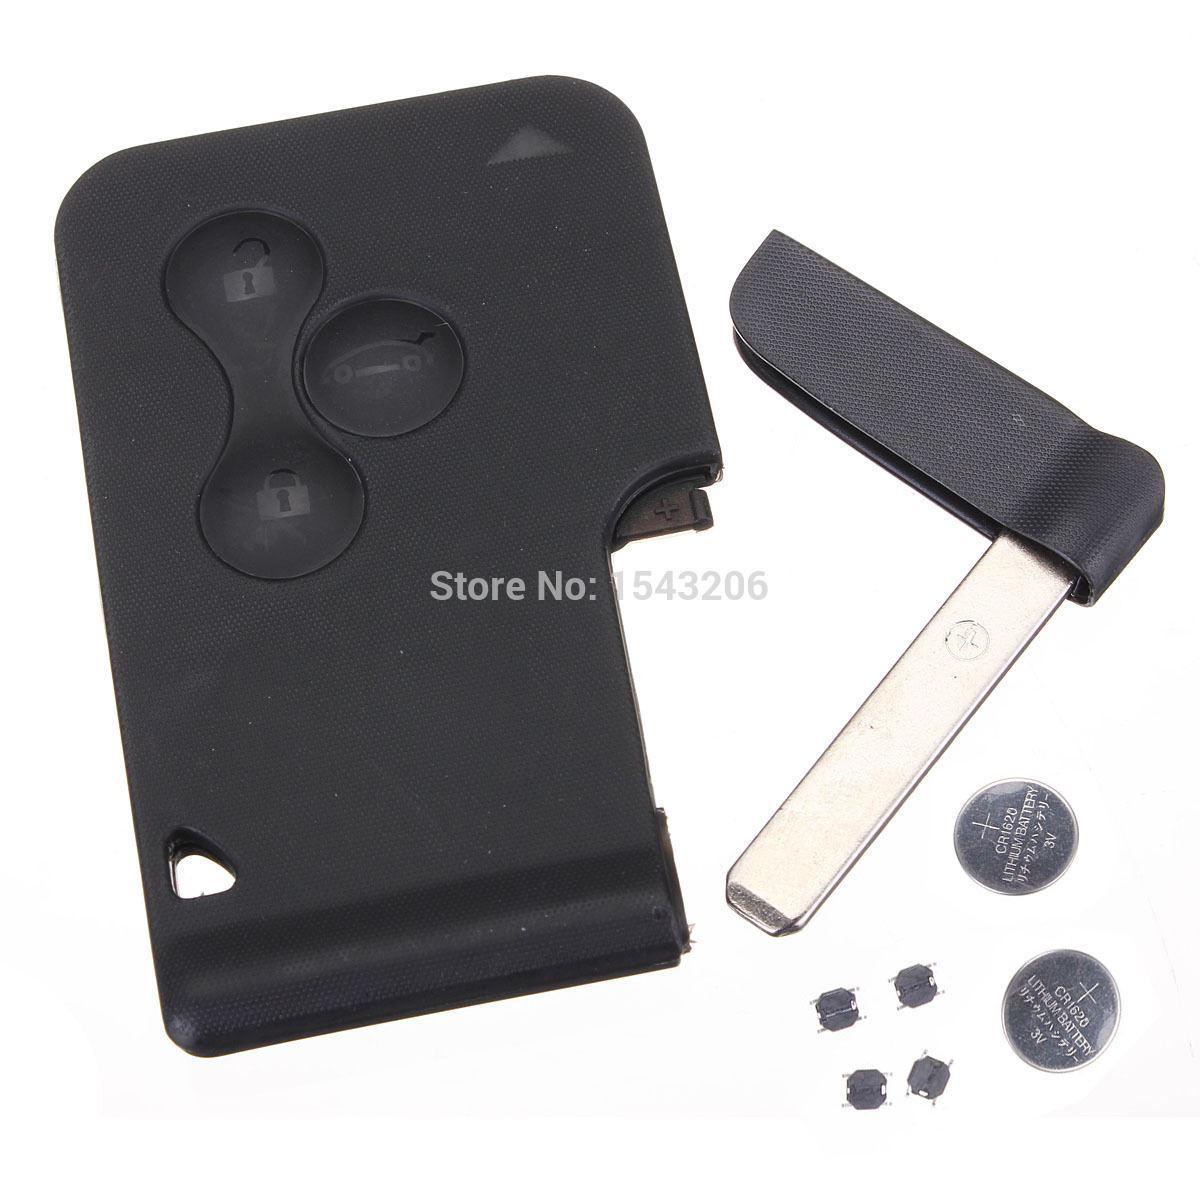 best car remote key shell case kit battery switch blade for renault clio megane scenic under 16. Black Bedroom Furniture Sets. Home Design Ideas